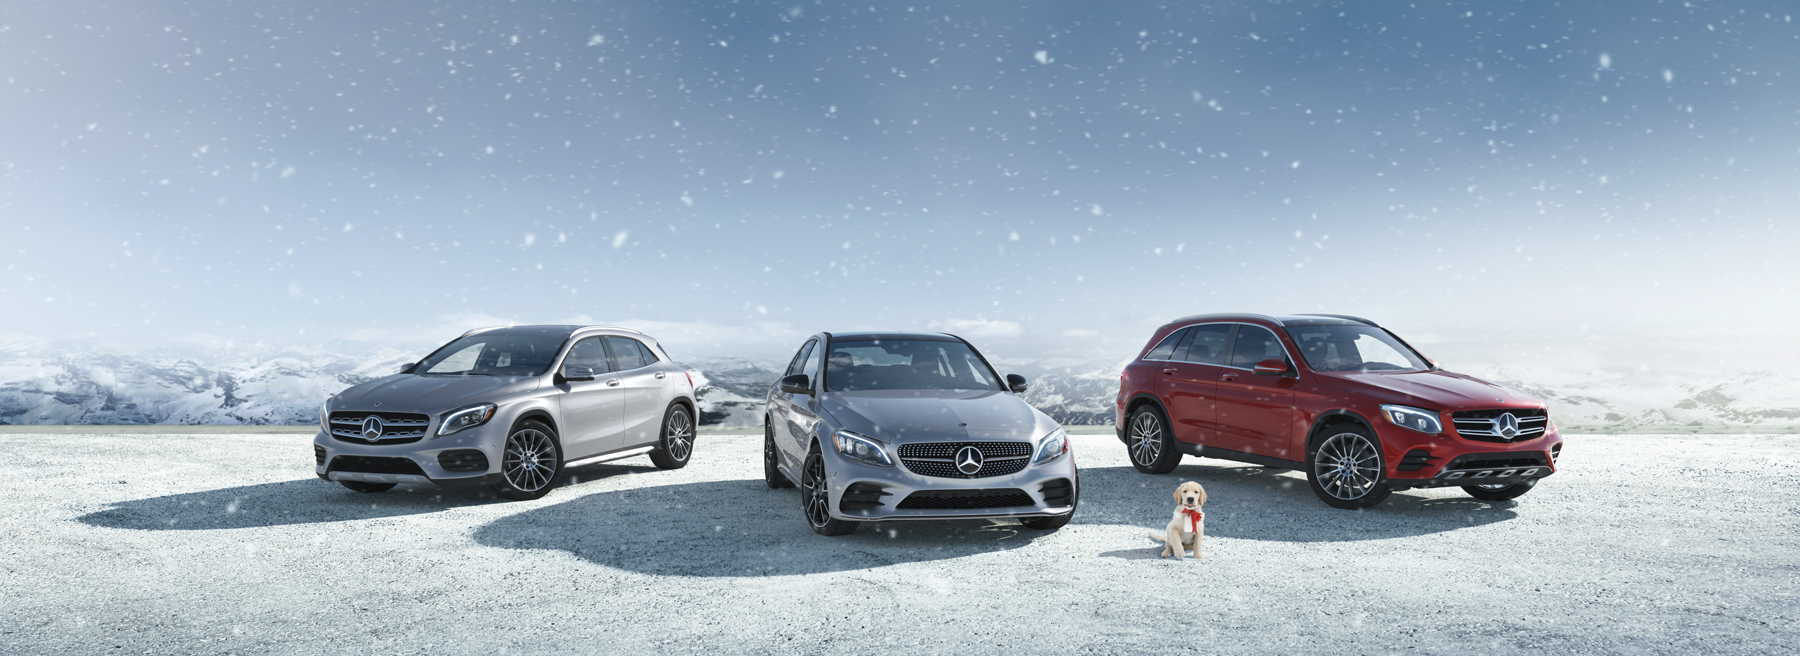 The Mercedes-Benz Winter Event